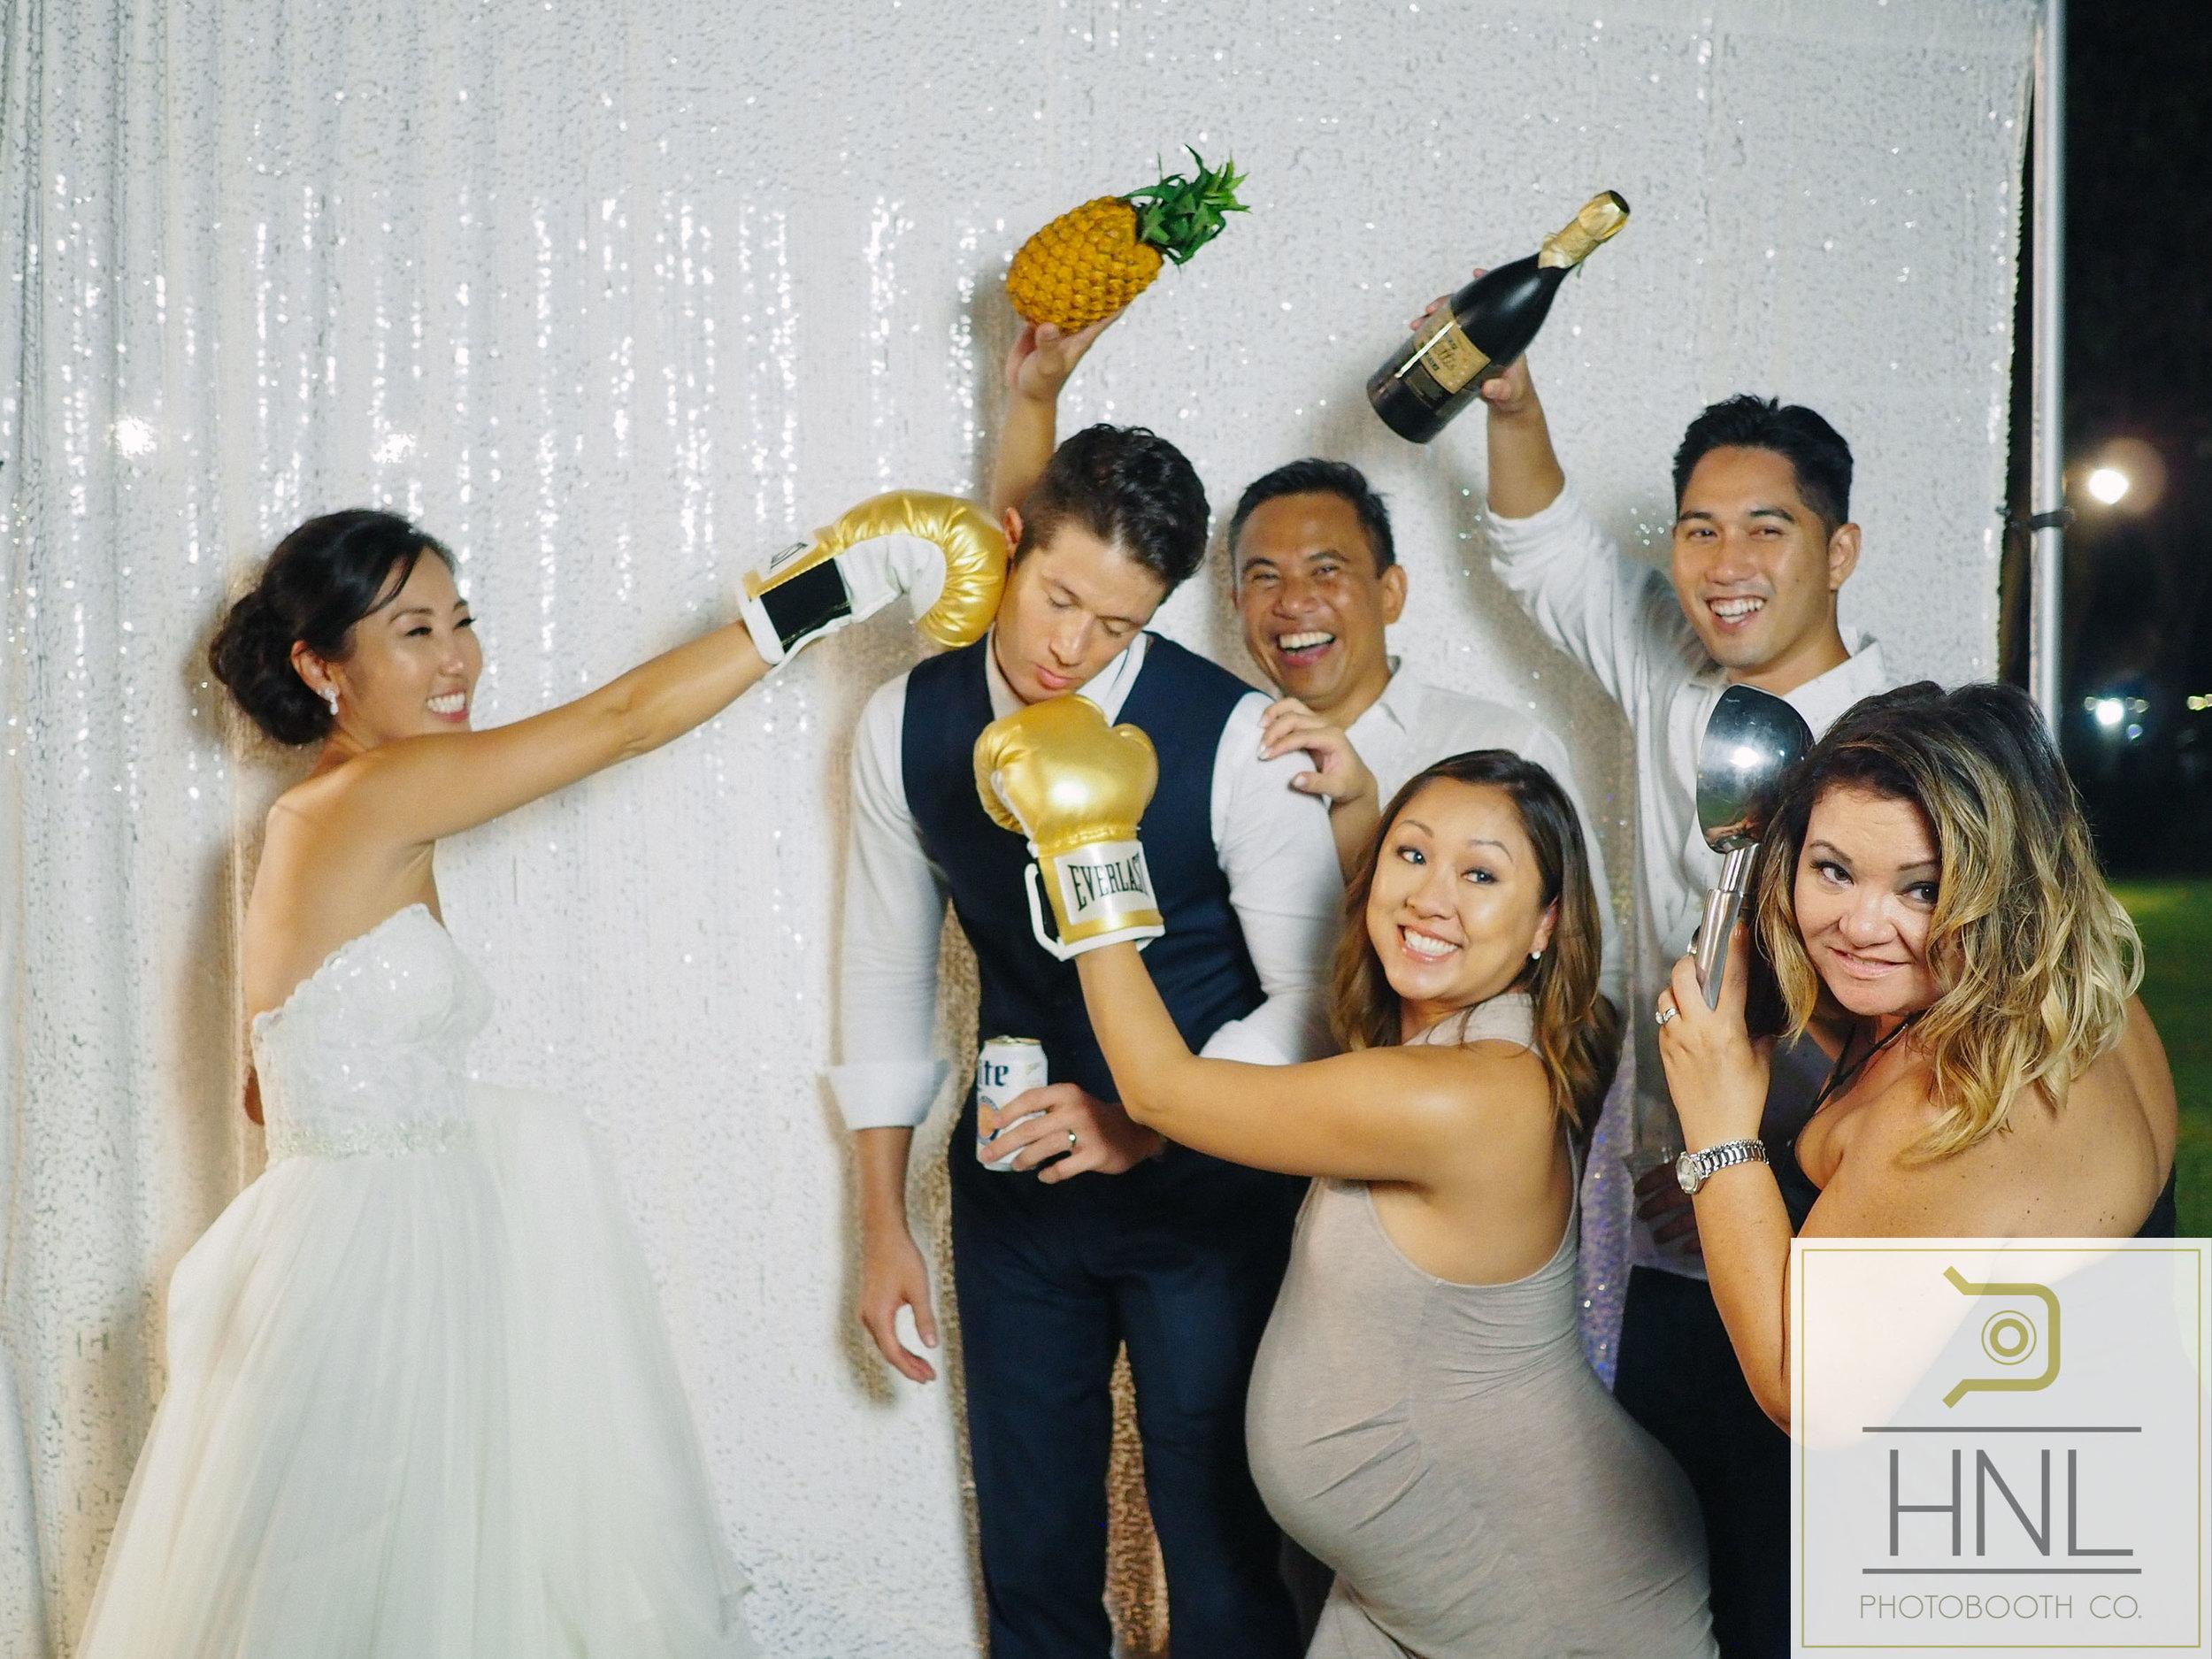 Miki and Dan wedding photo booth lanikohonua ko olina kapolei Oahu Hawaii -112.jpg